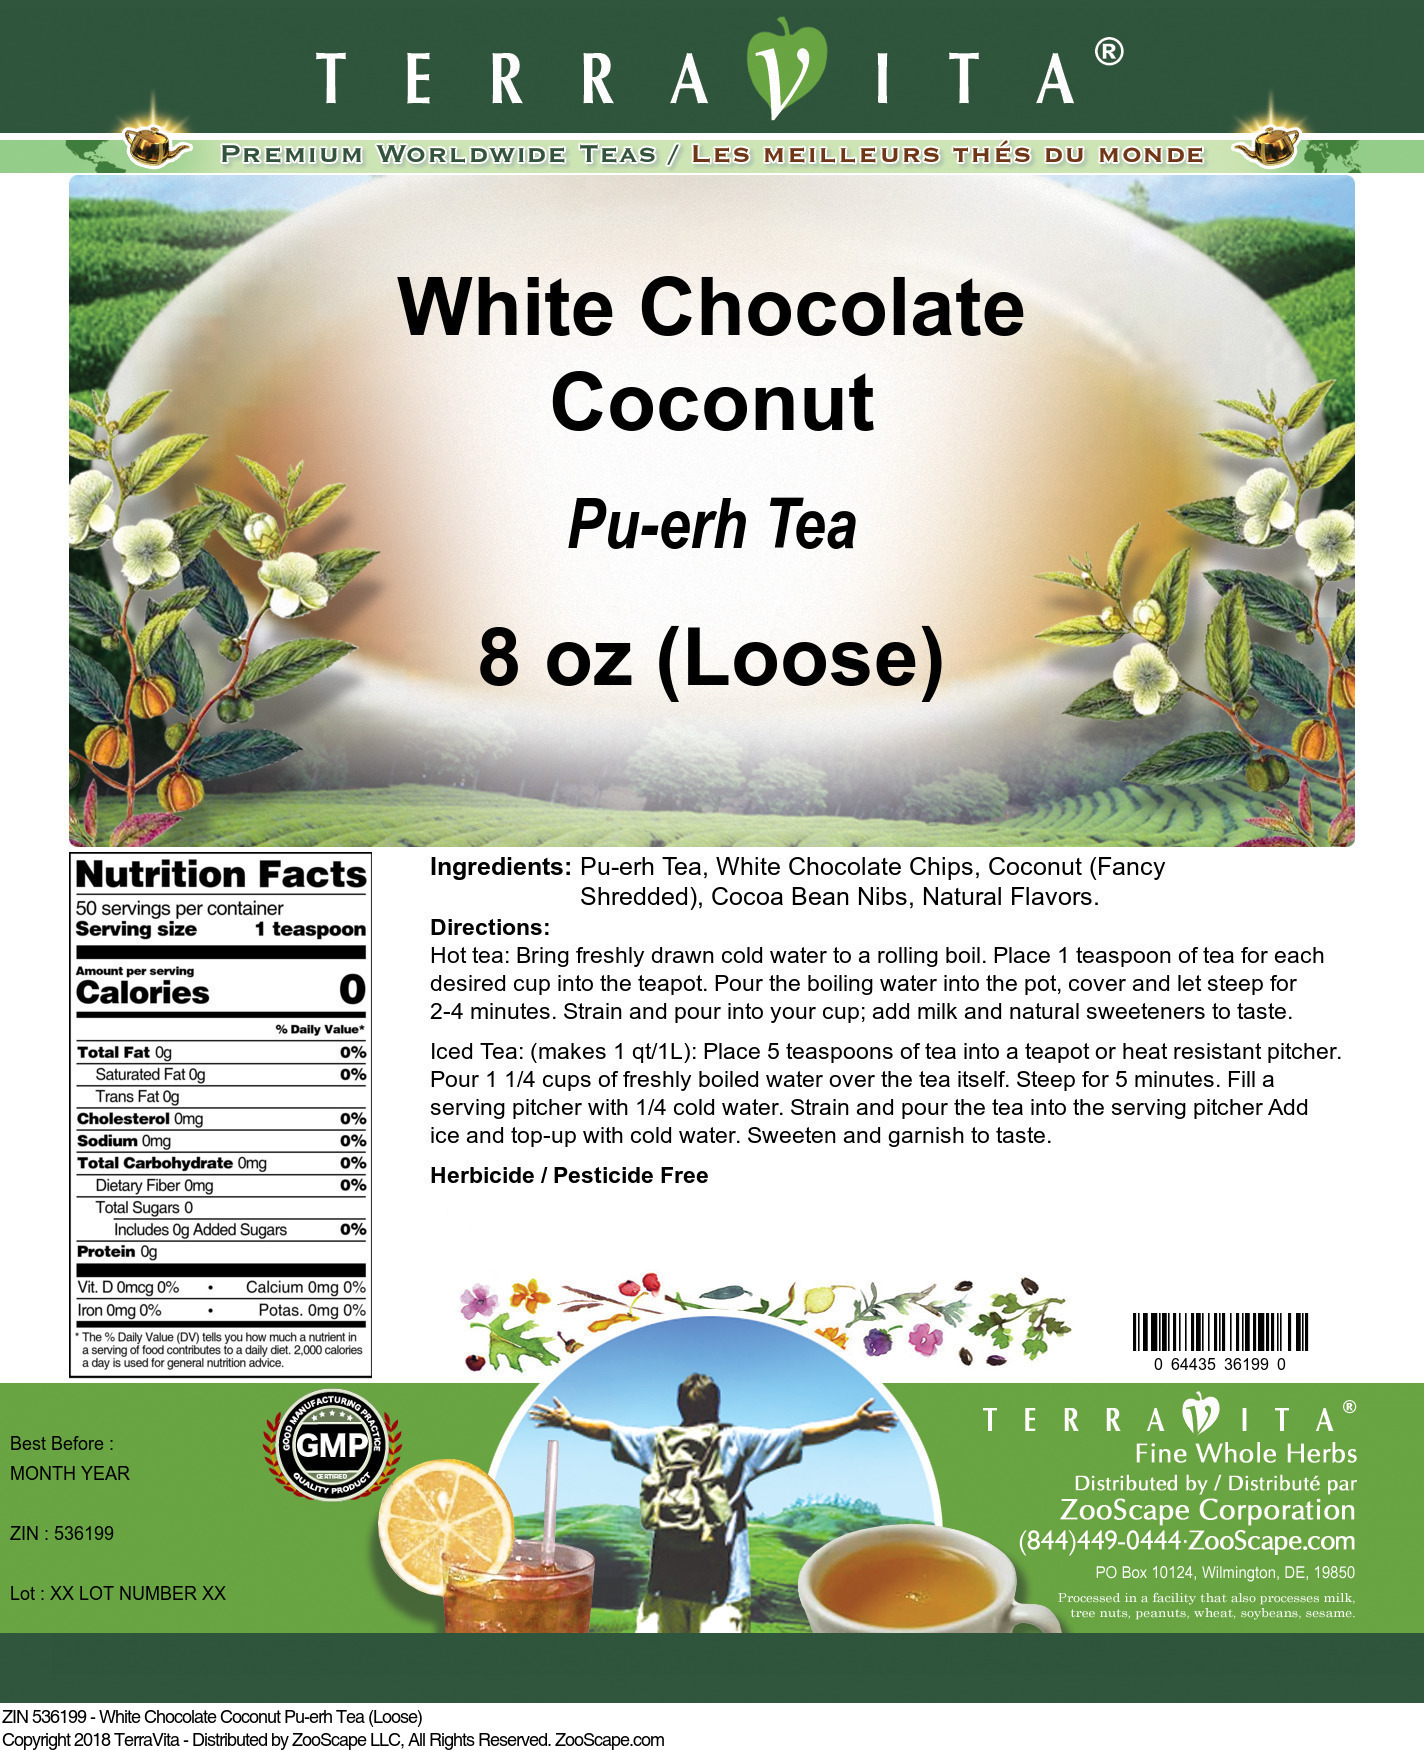 White Chocolate Coconut Pu-erh Tea (Loose)